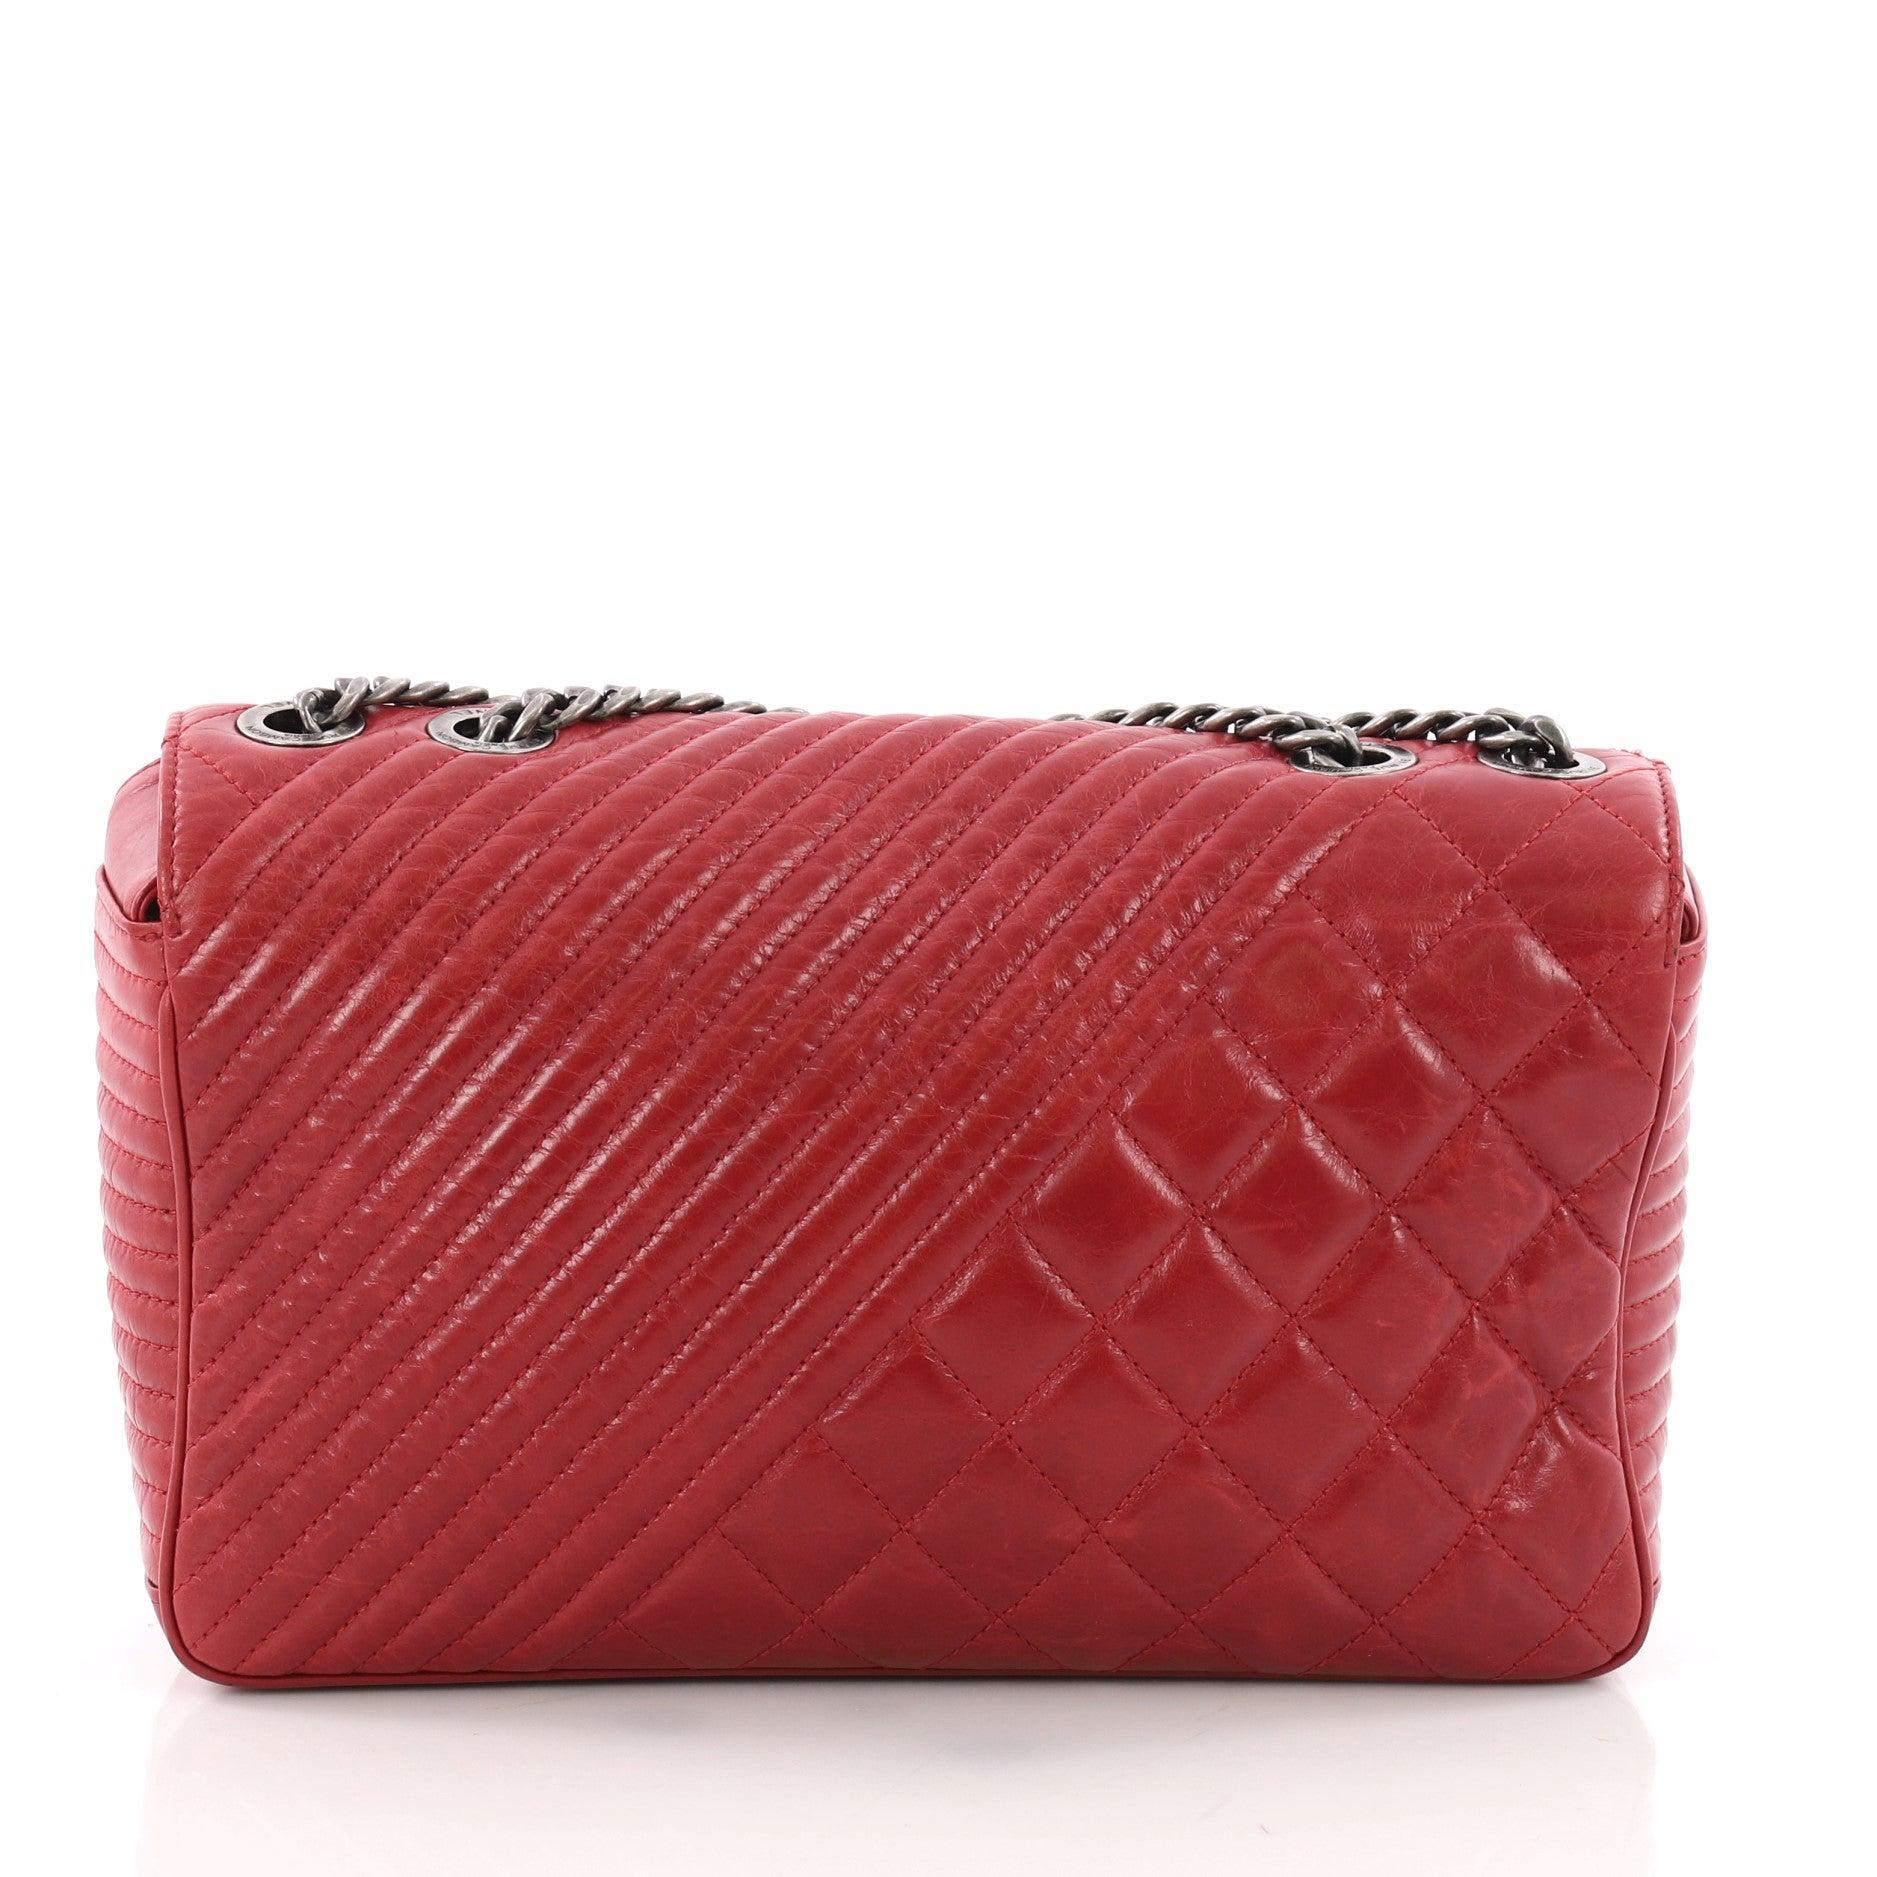 af813d9a90c36f Chanel Coco Boy Flap Bag Quilted Aged Calfskin Medium at 1stdibs